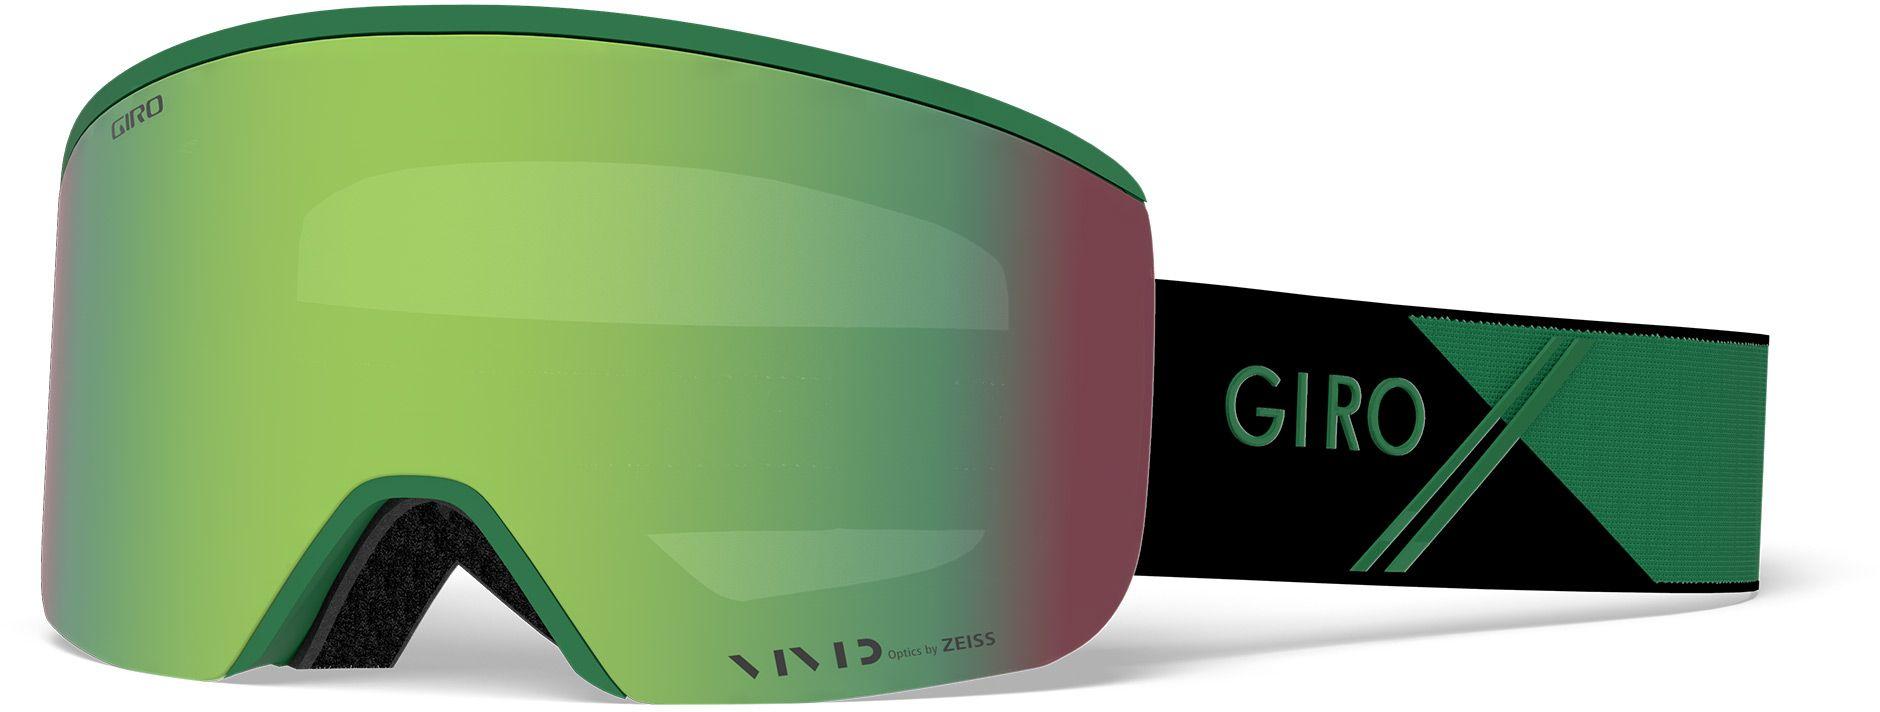 Lyžařské brýle Giro Axis Field Green Sport Tech Vivid Emerald Vivid  Infrared (2Skla) ... f390675bce649